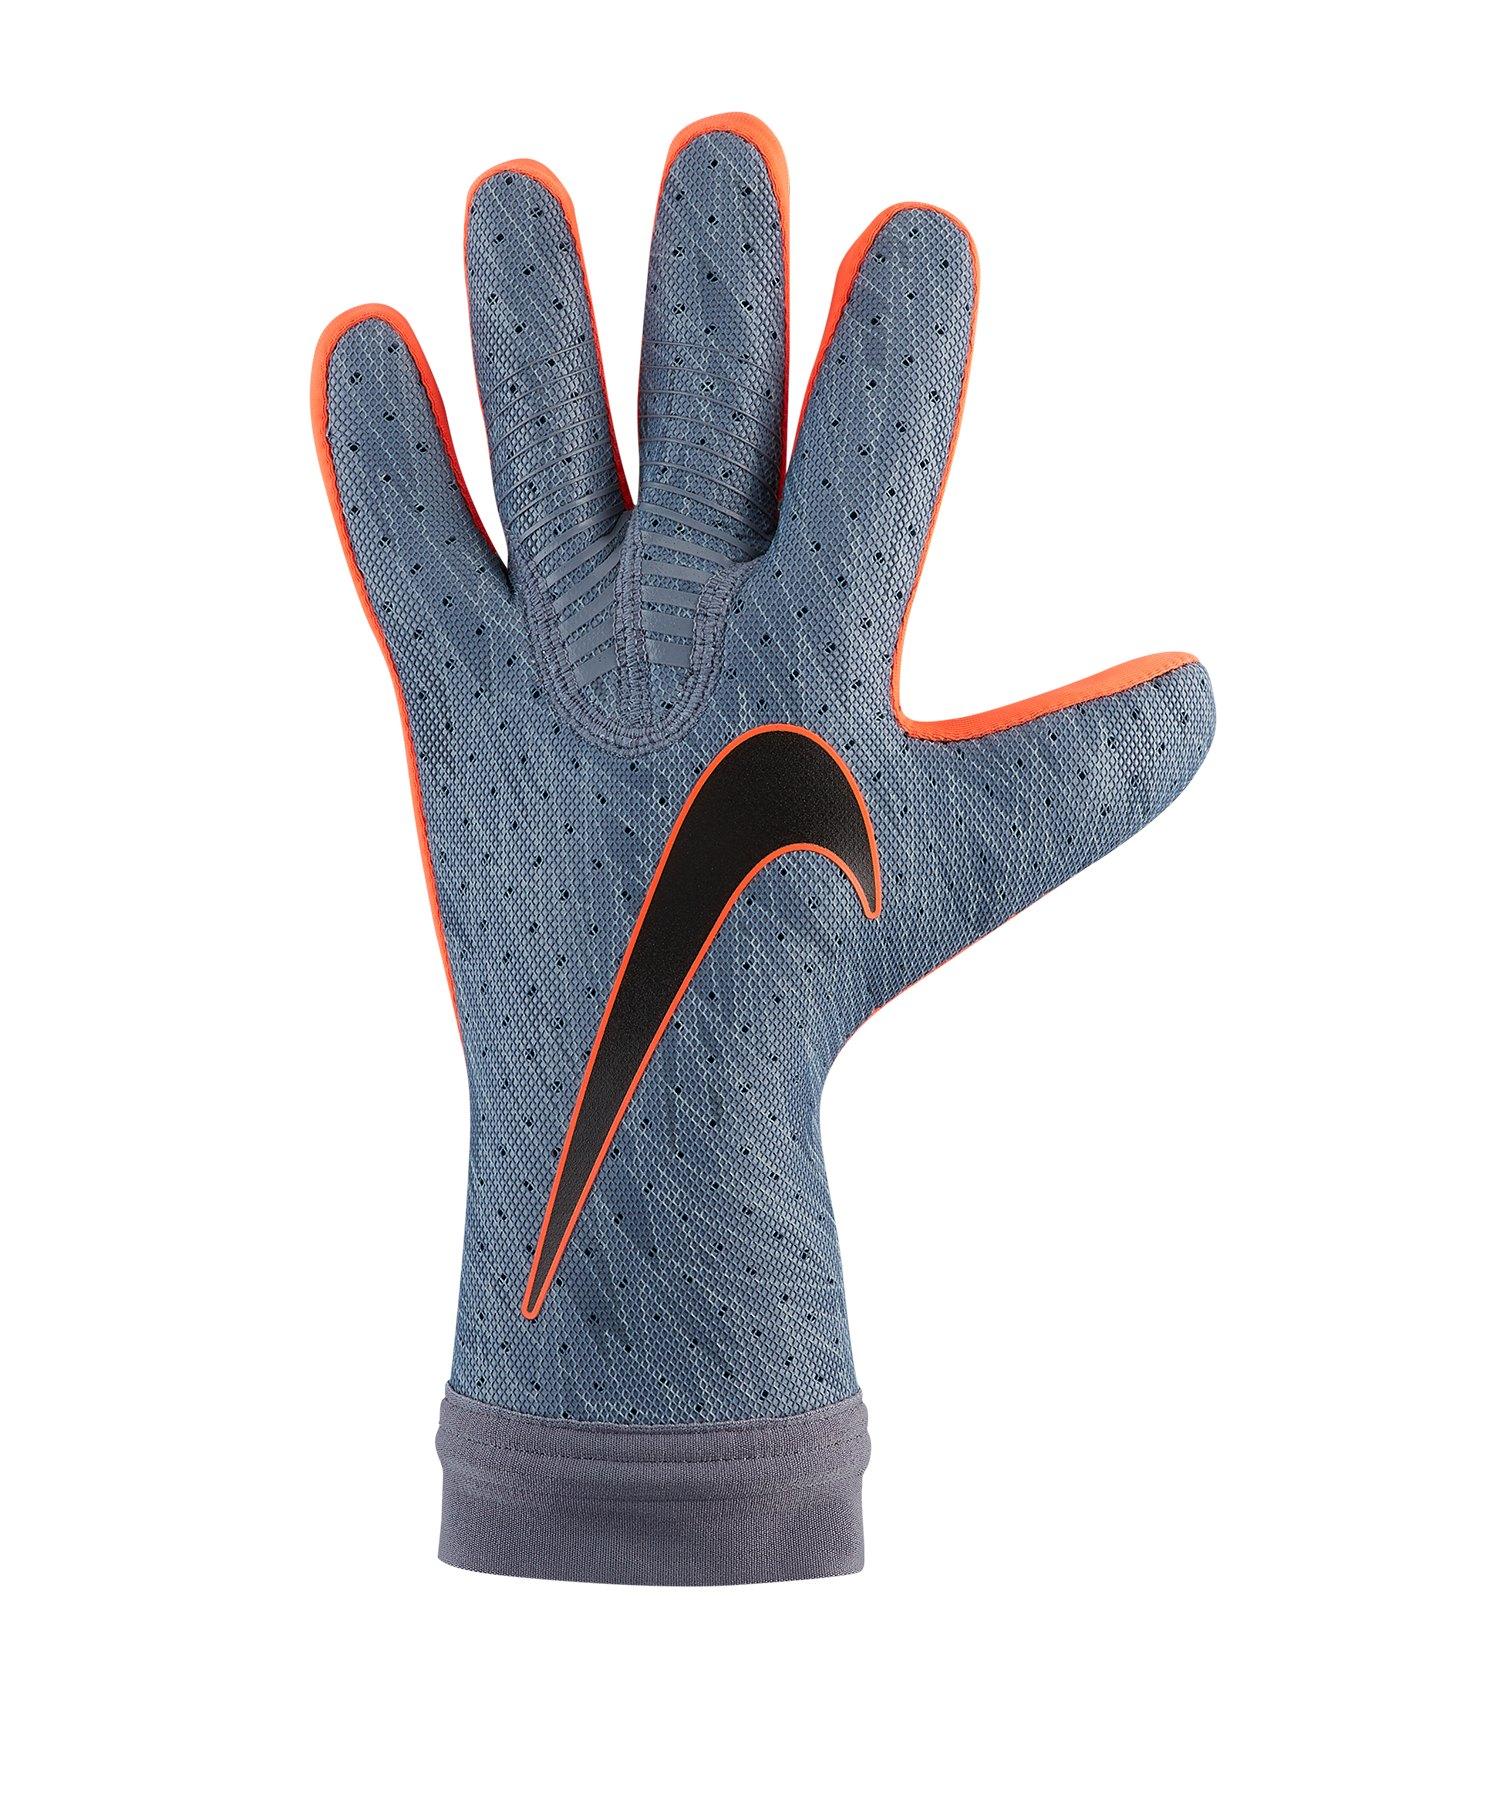 Nike Mercurial Touch Elite Torwarthandschuh F490 - Blau